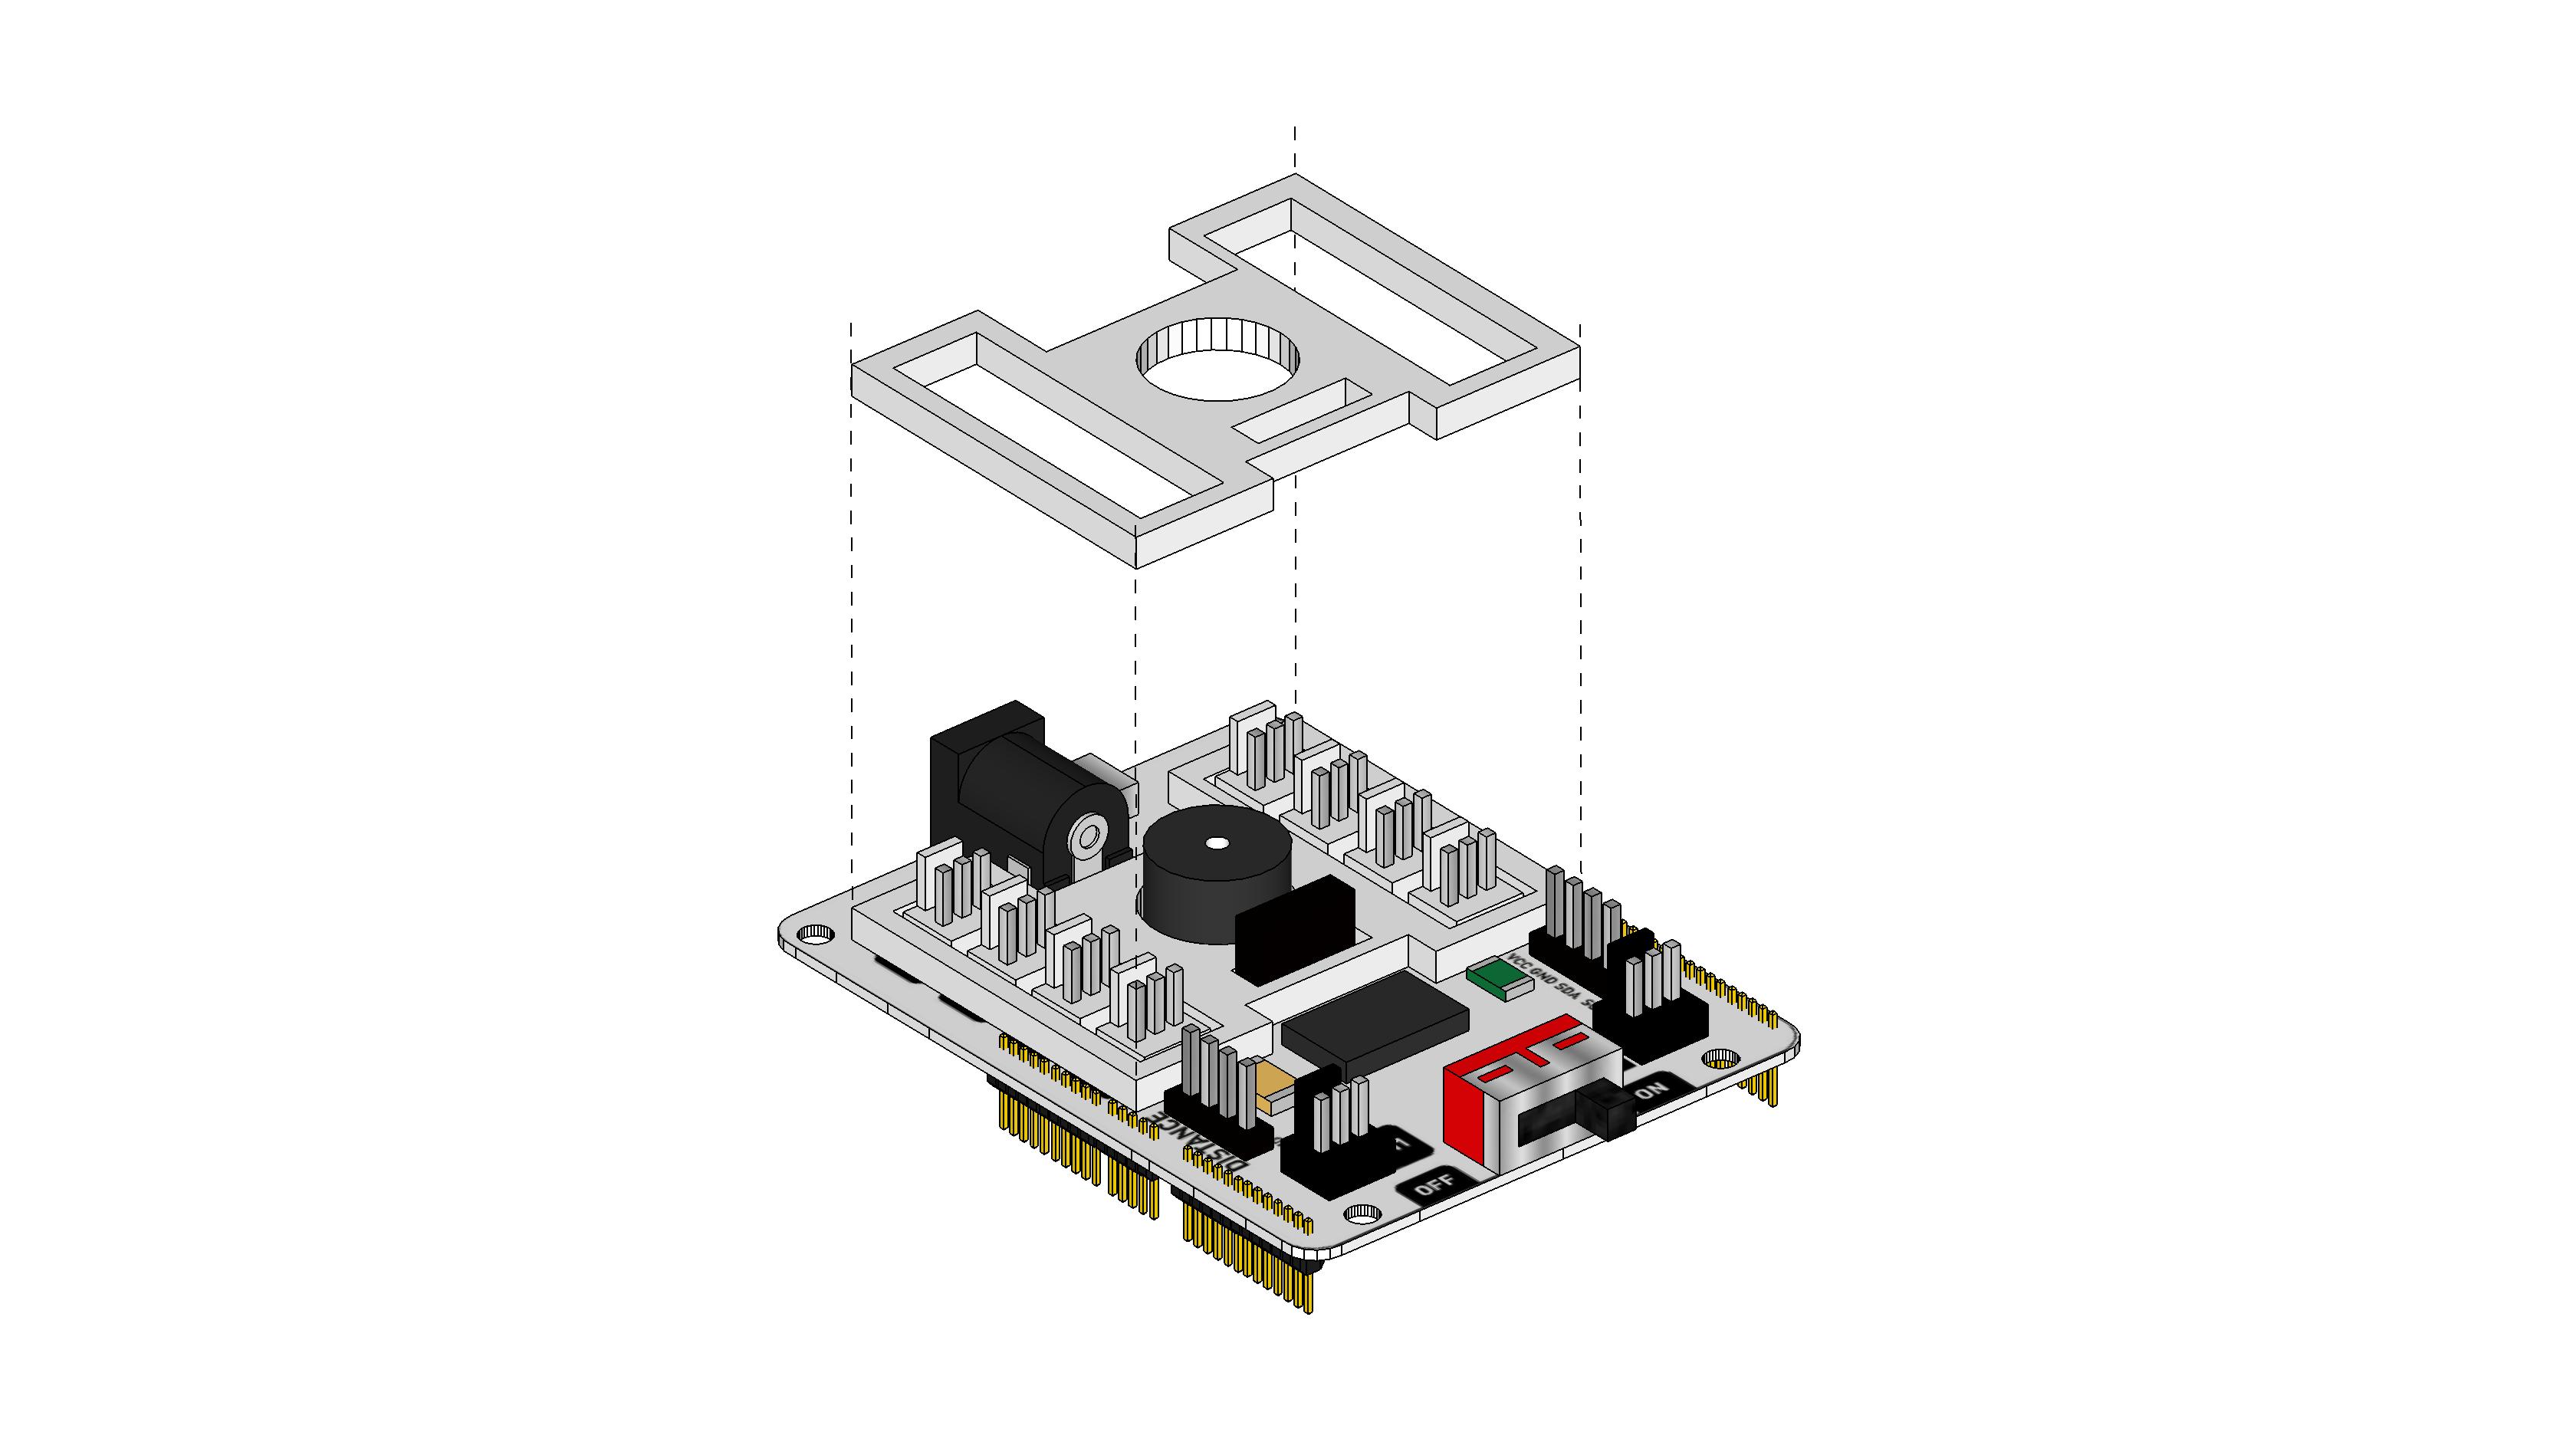 LOFI_Robot_Rover_assembly (16)